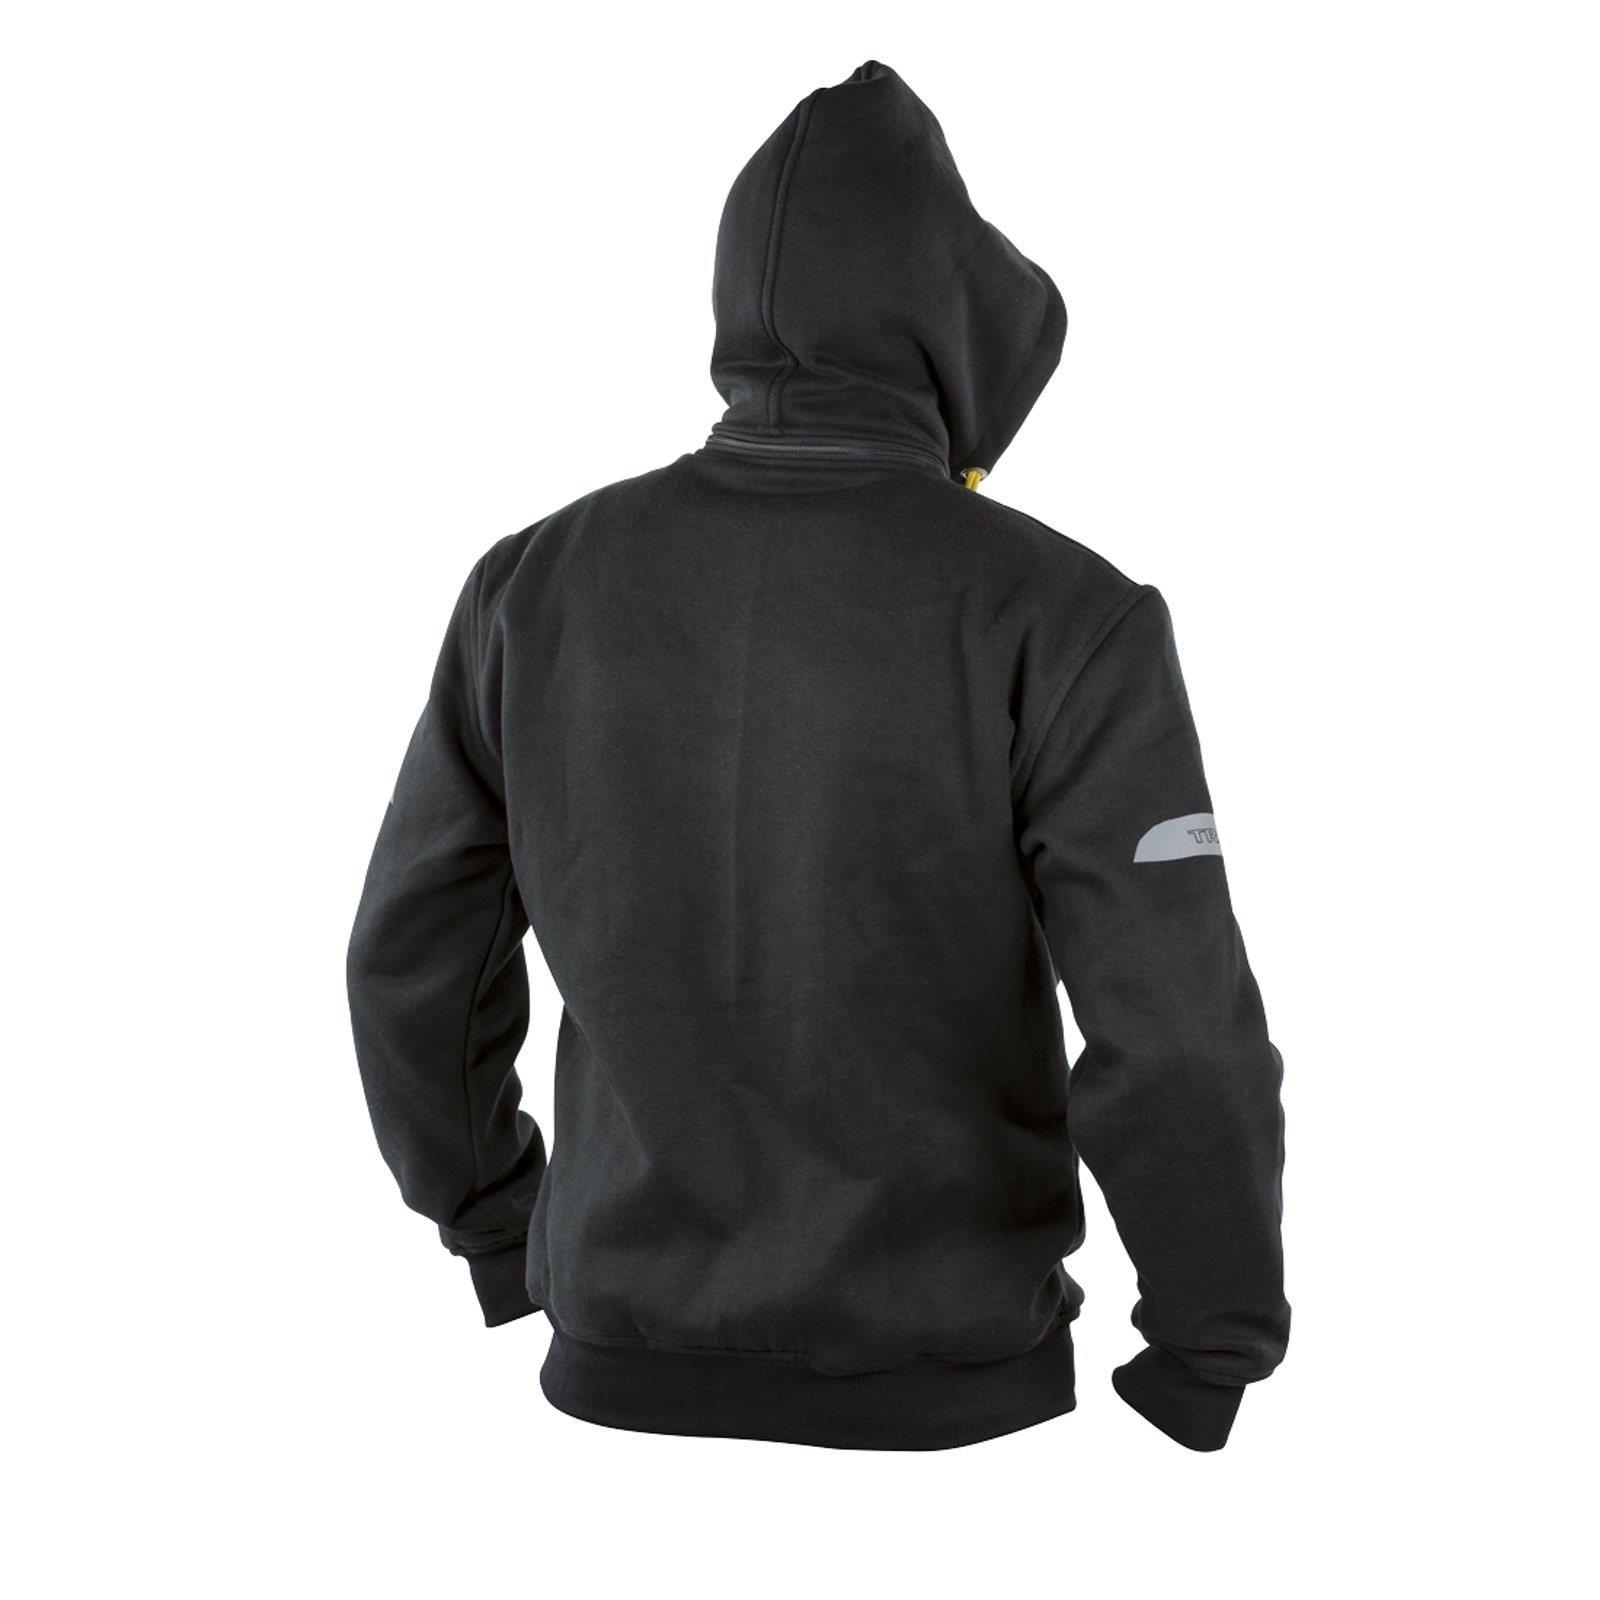 trilobite illenius basic motorrad hoodie kapuzen pullover. Black Bedroom Furniture Sets. Home Design Ideas